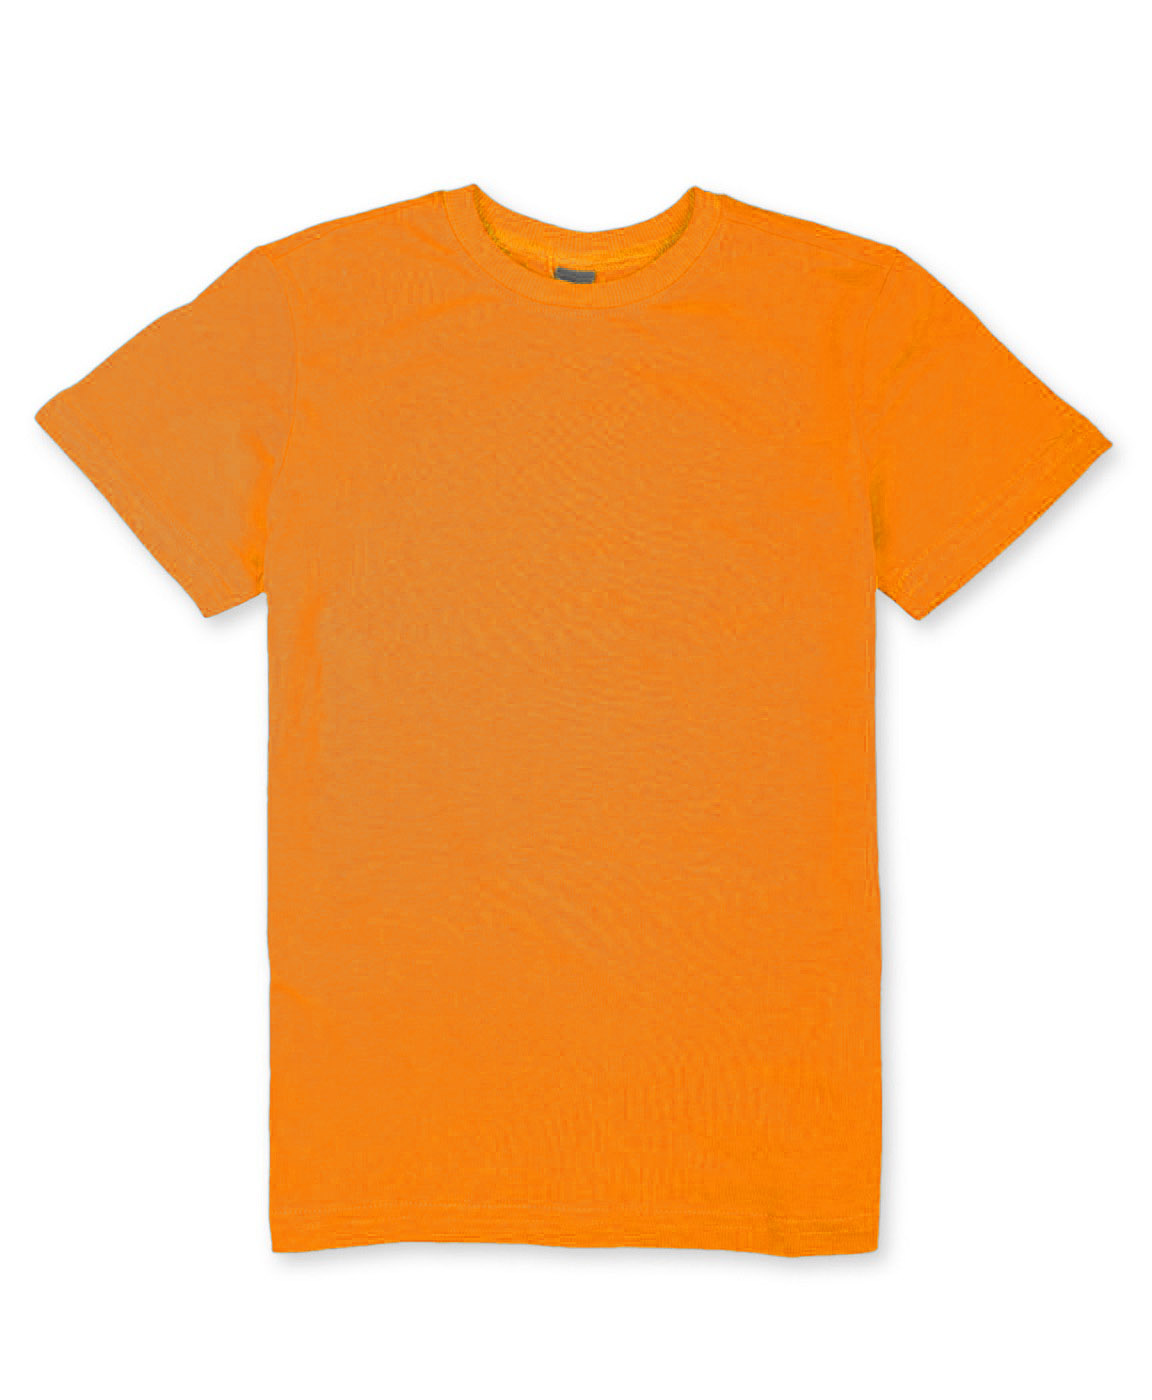 Футболка однотонная оранжеваяКоллекция ВЕСНА-ЛЕТО<br><br><br>Размер: 66